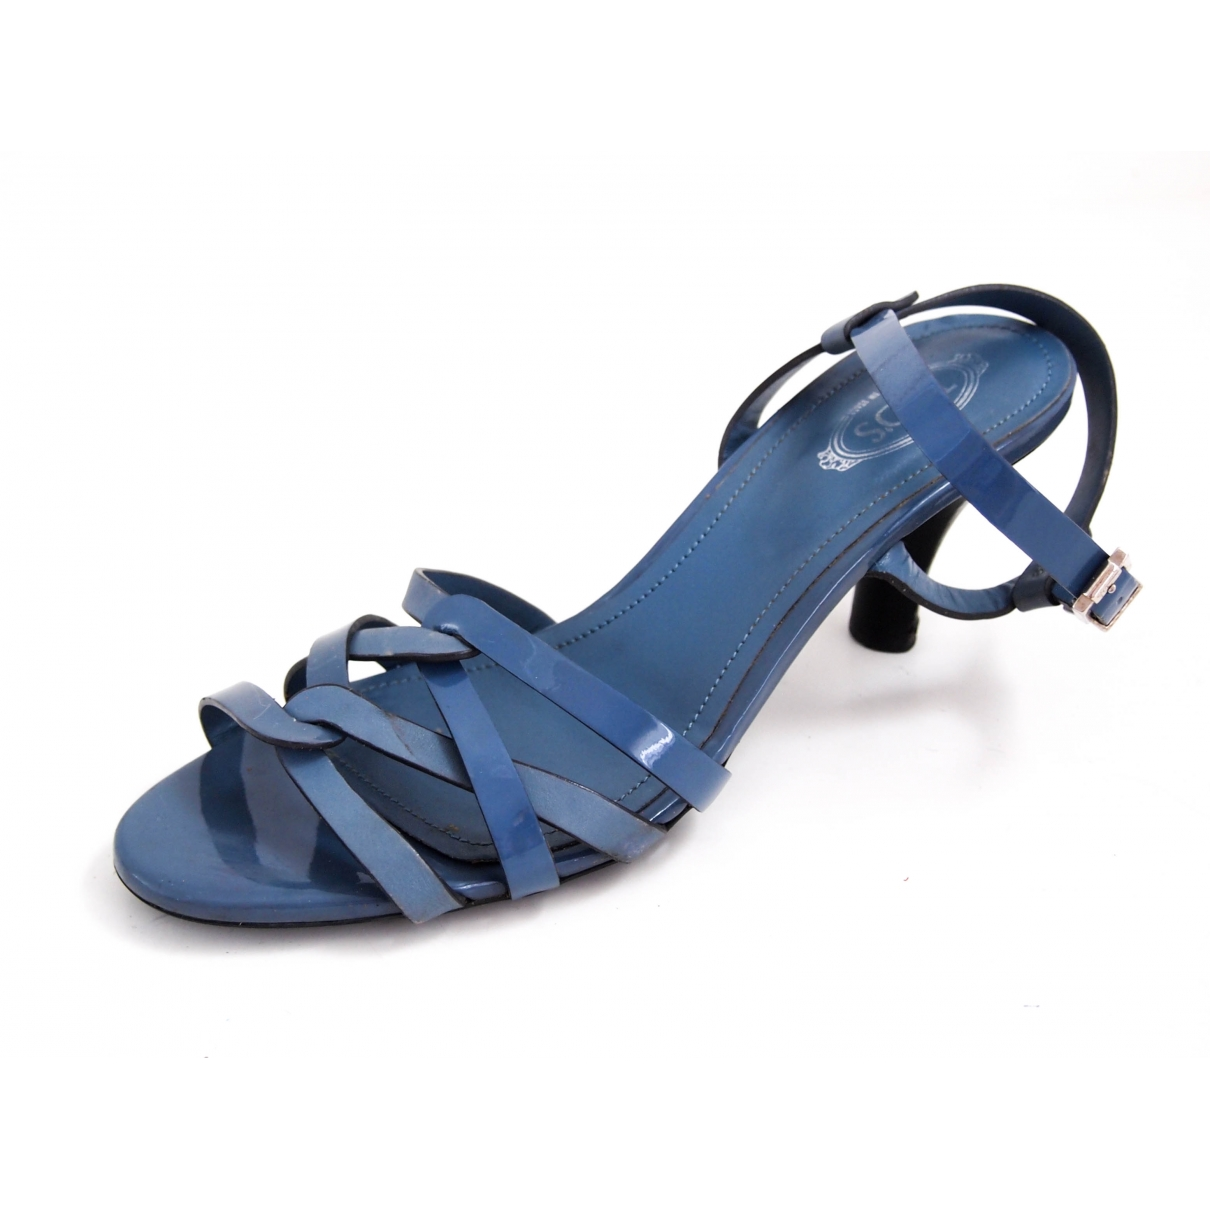 Sandalias de Charol Tods